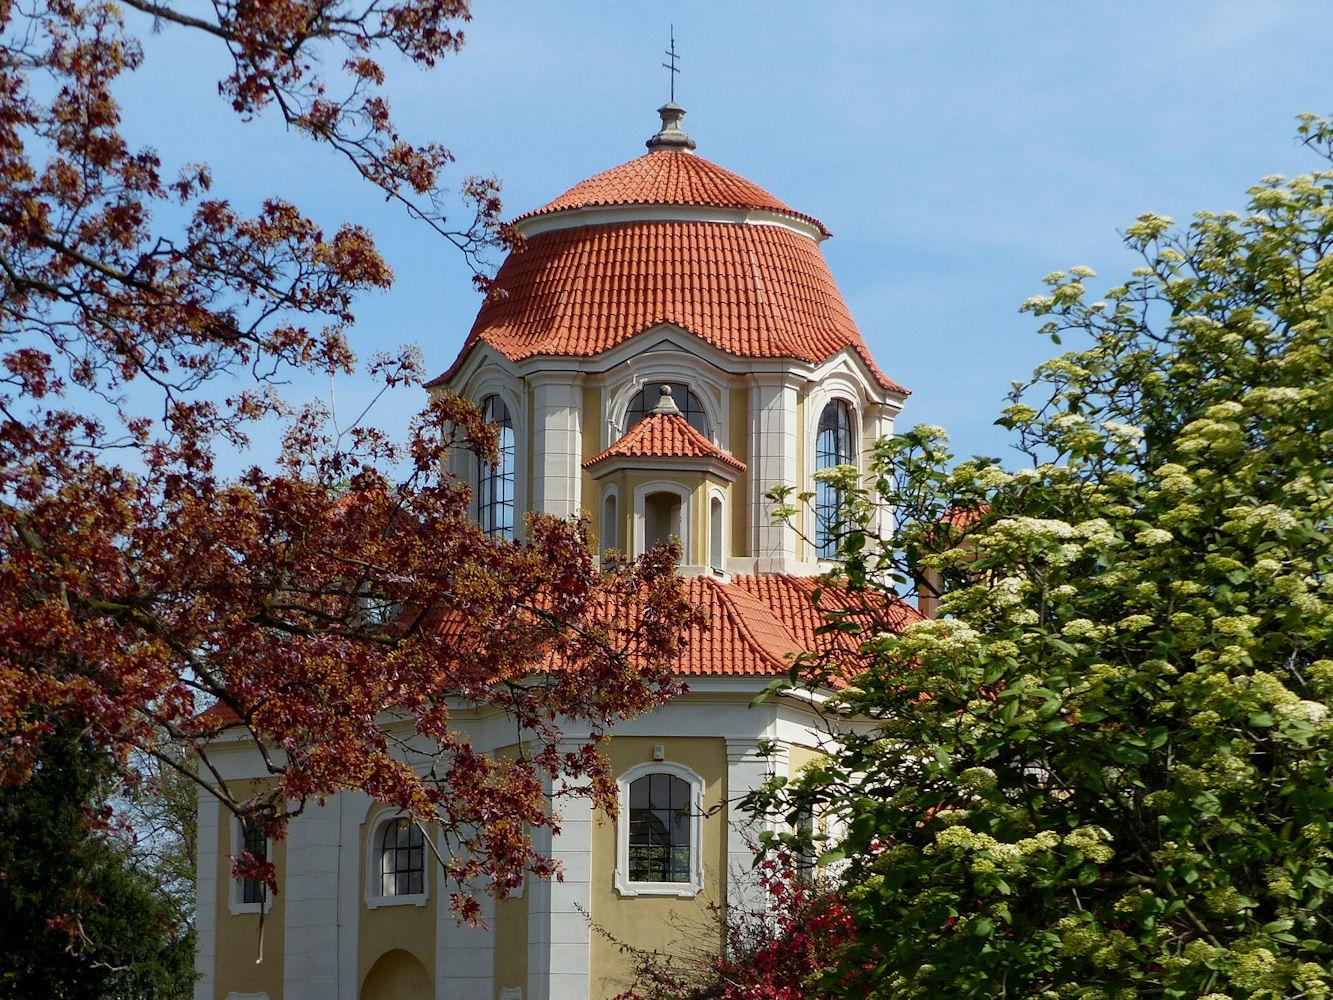 Upper Chateau, Panenske Brezany